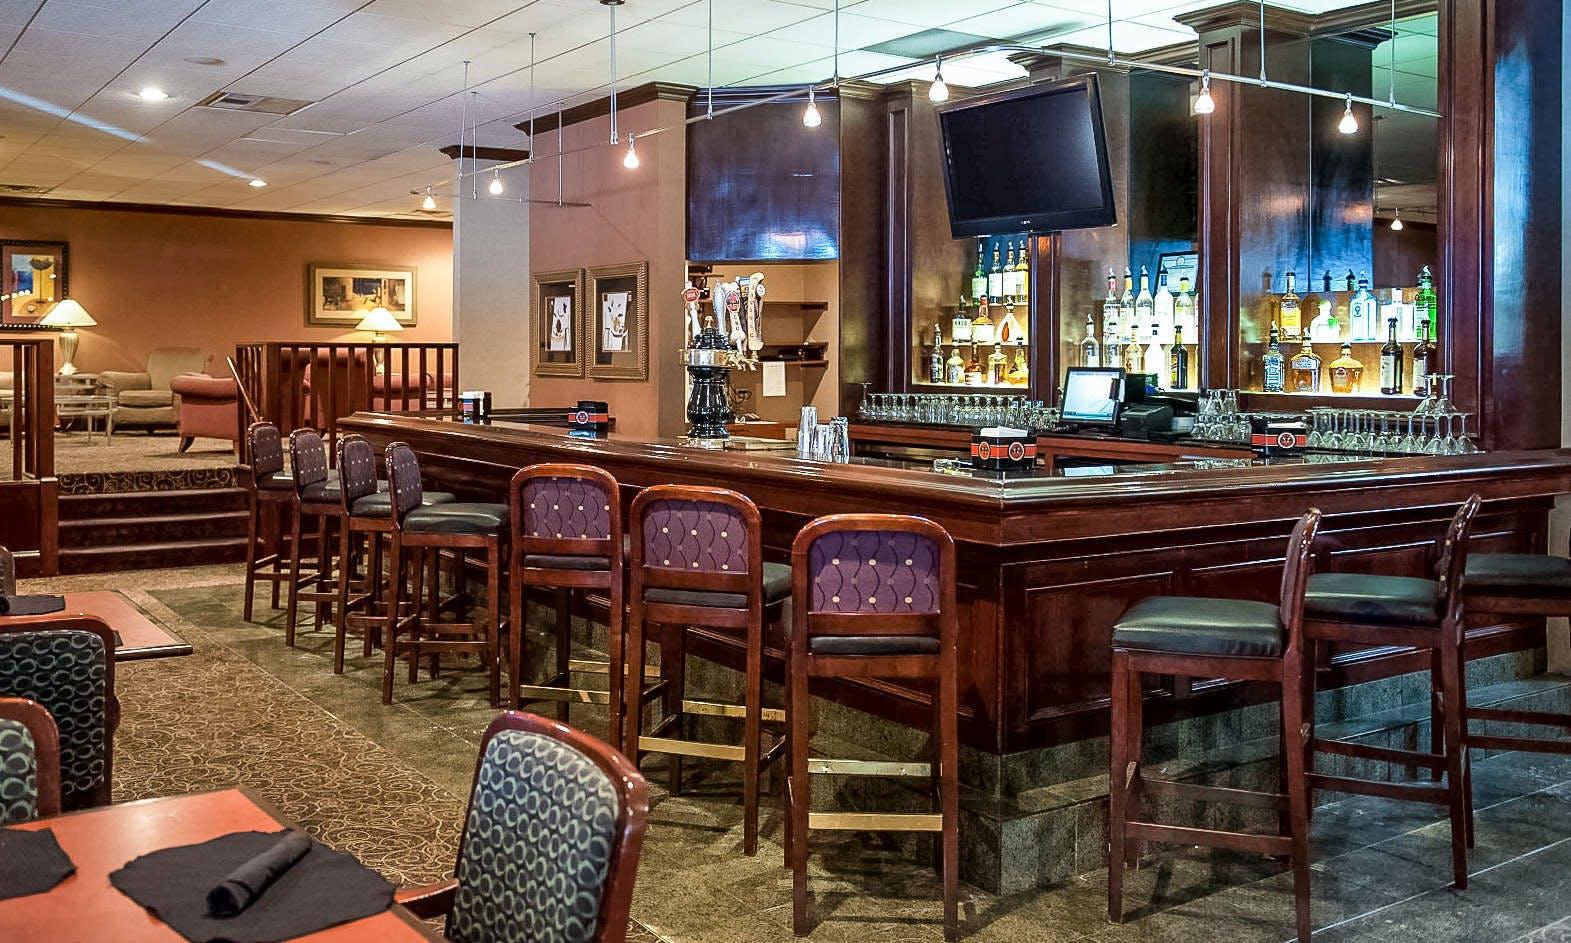 Last Minute Hotel Deals in Syracuse - HotelTonight